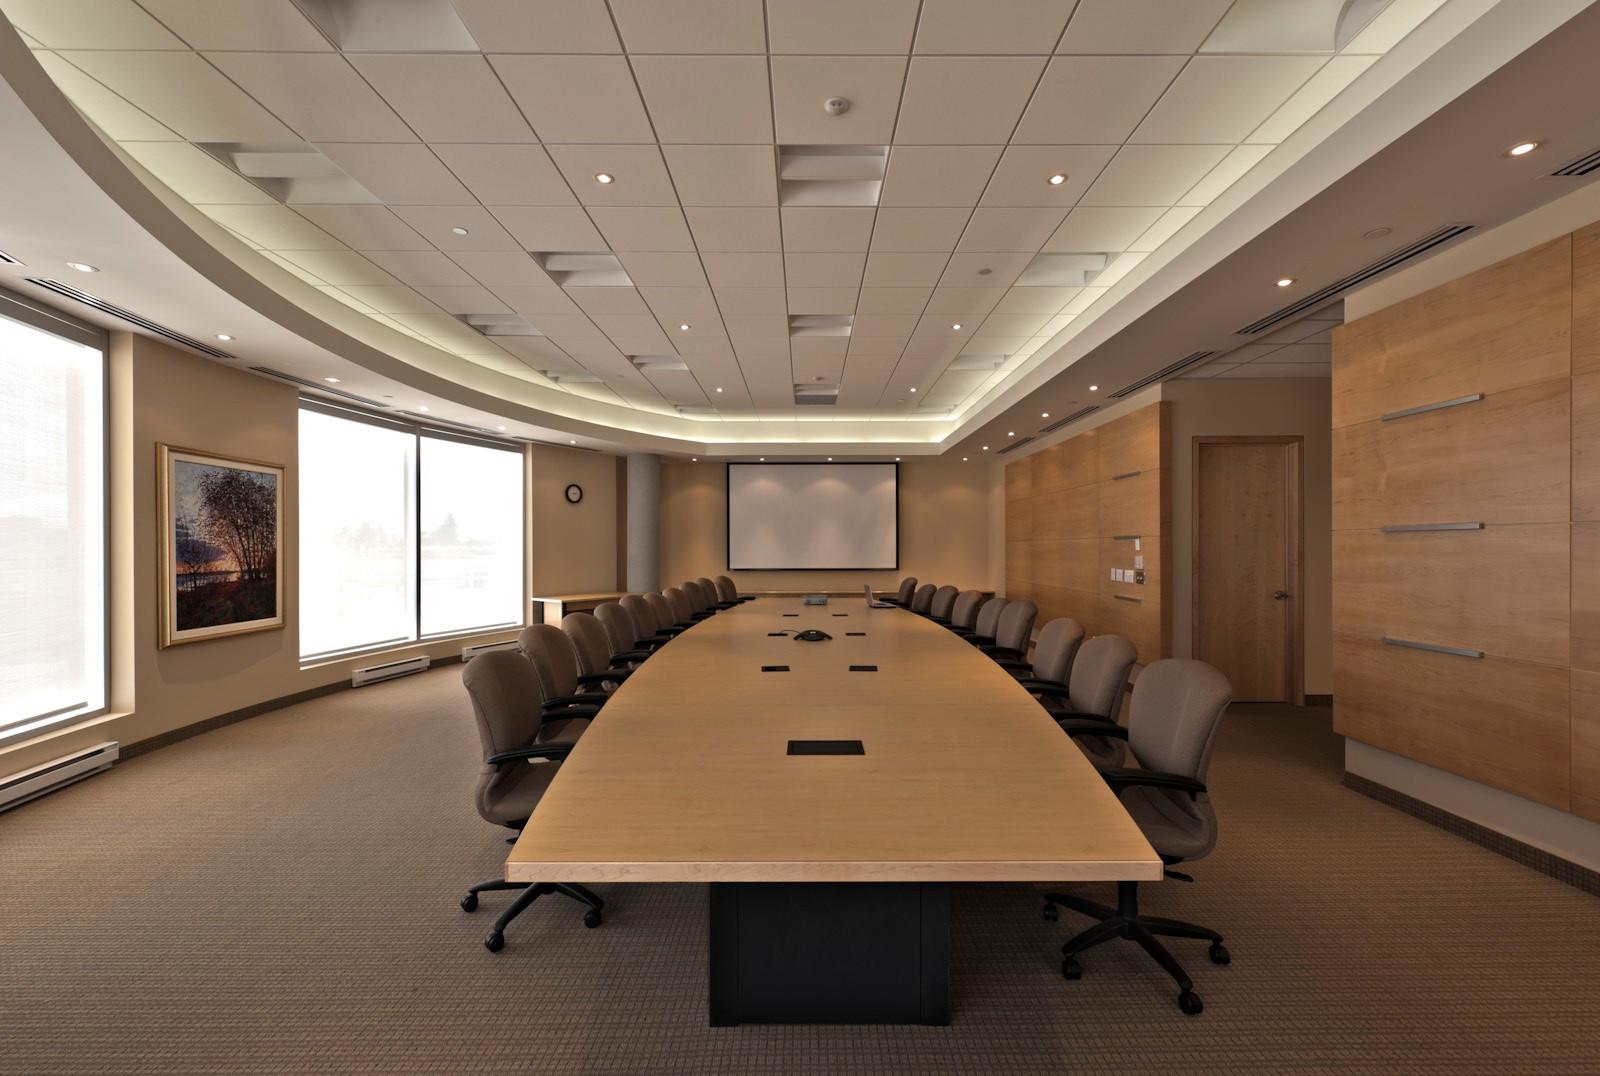 Accreditation Canada lobby and boardroom